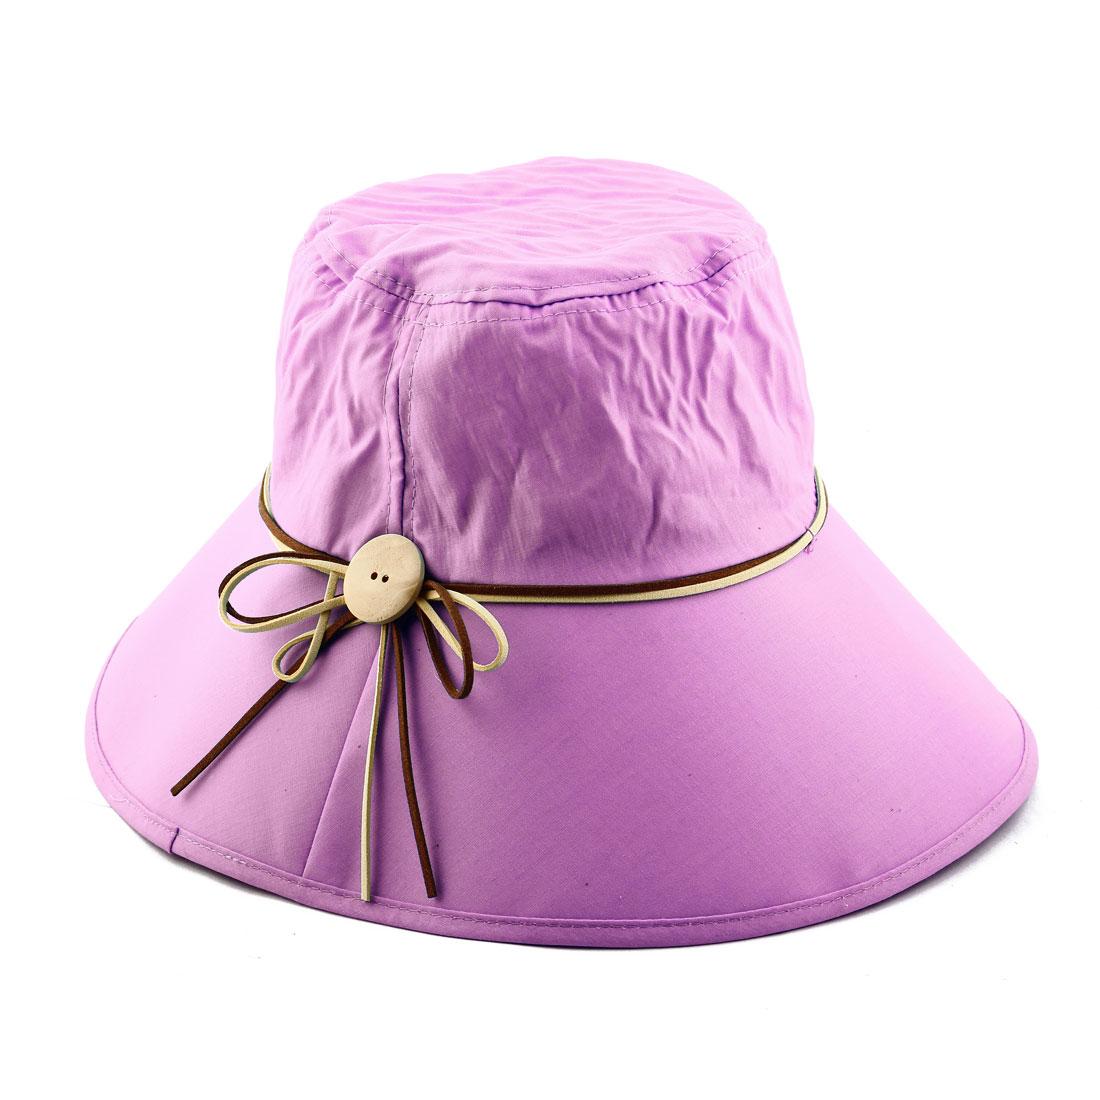 Woman Bowknot Wooden Buckle Decor Adjustable Wide Brim Summer Beach Cap Sun Hat Pink